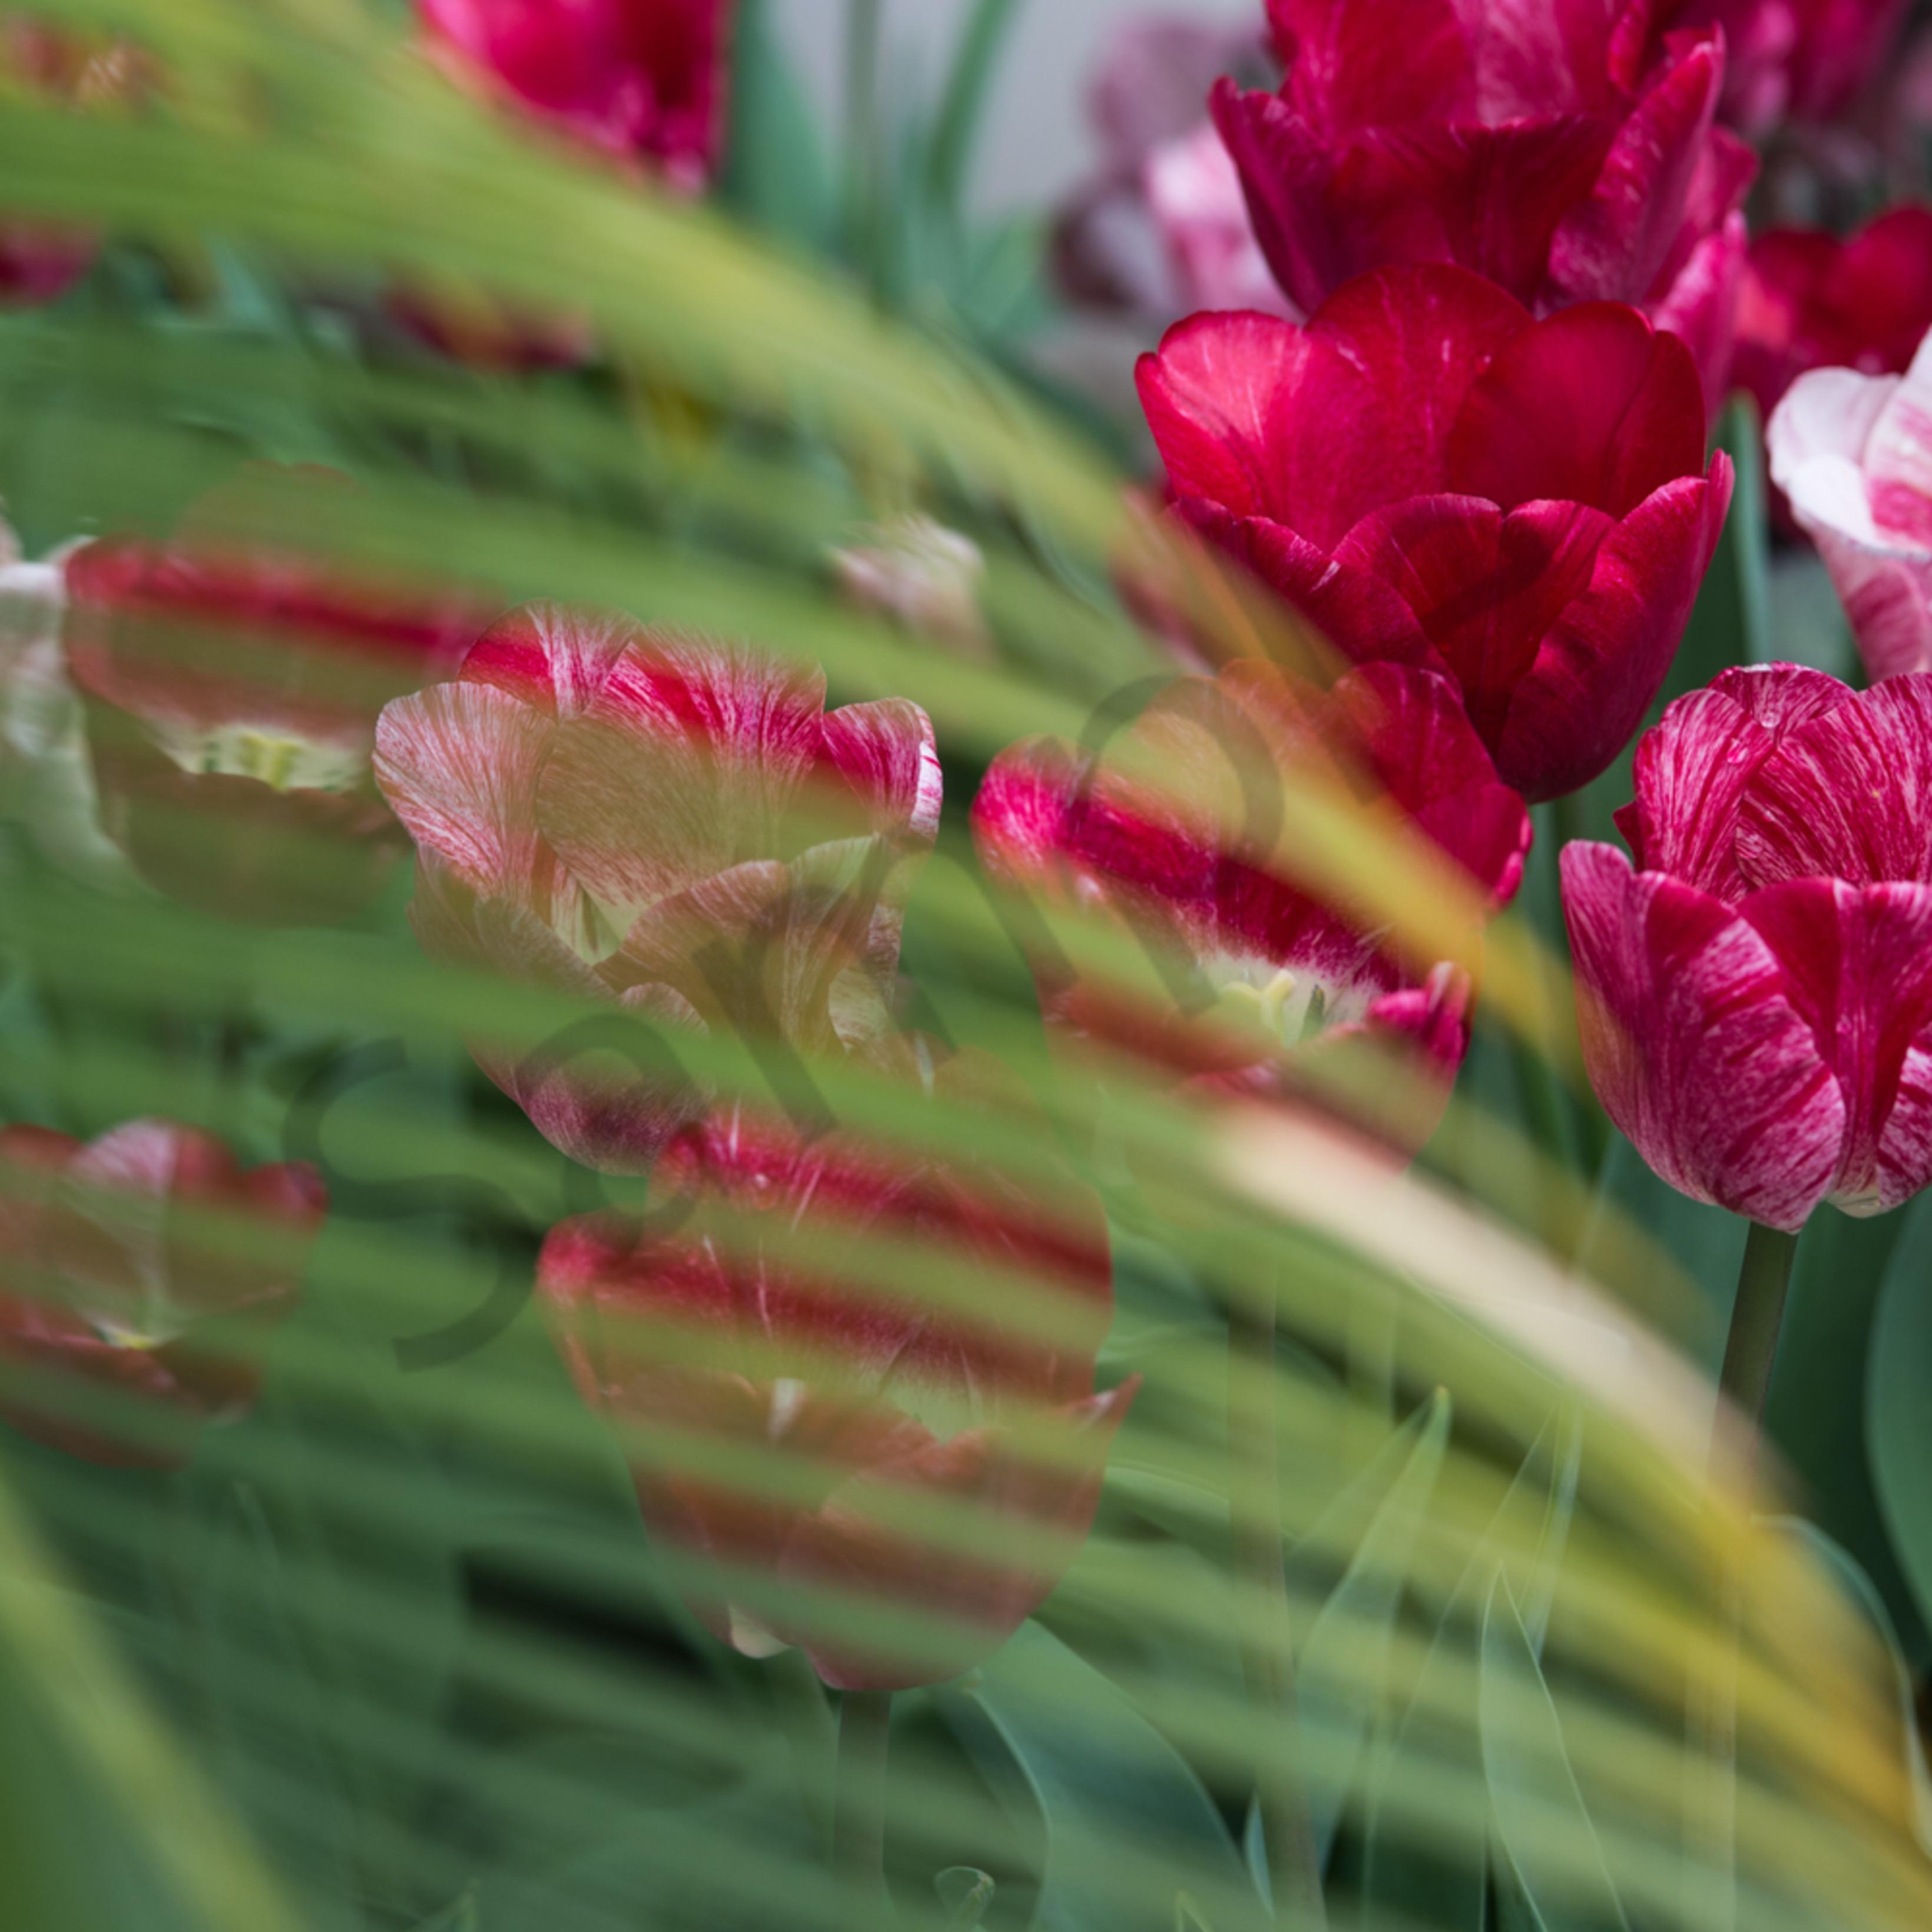 Tulips 6 phmqy5